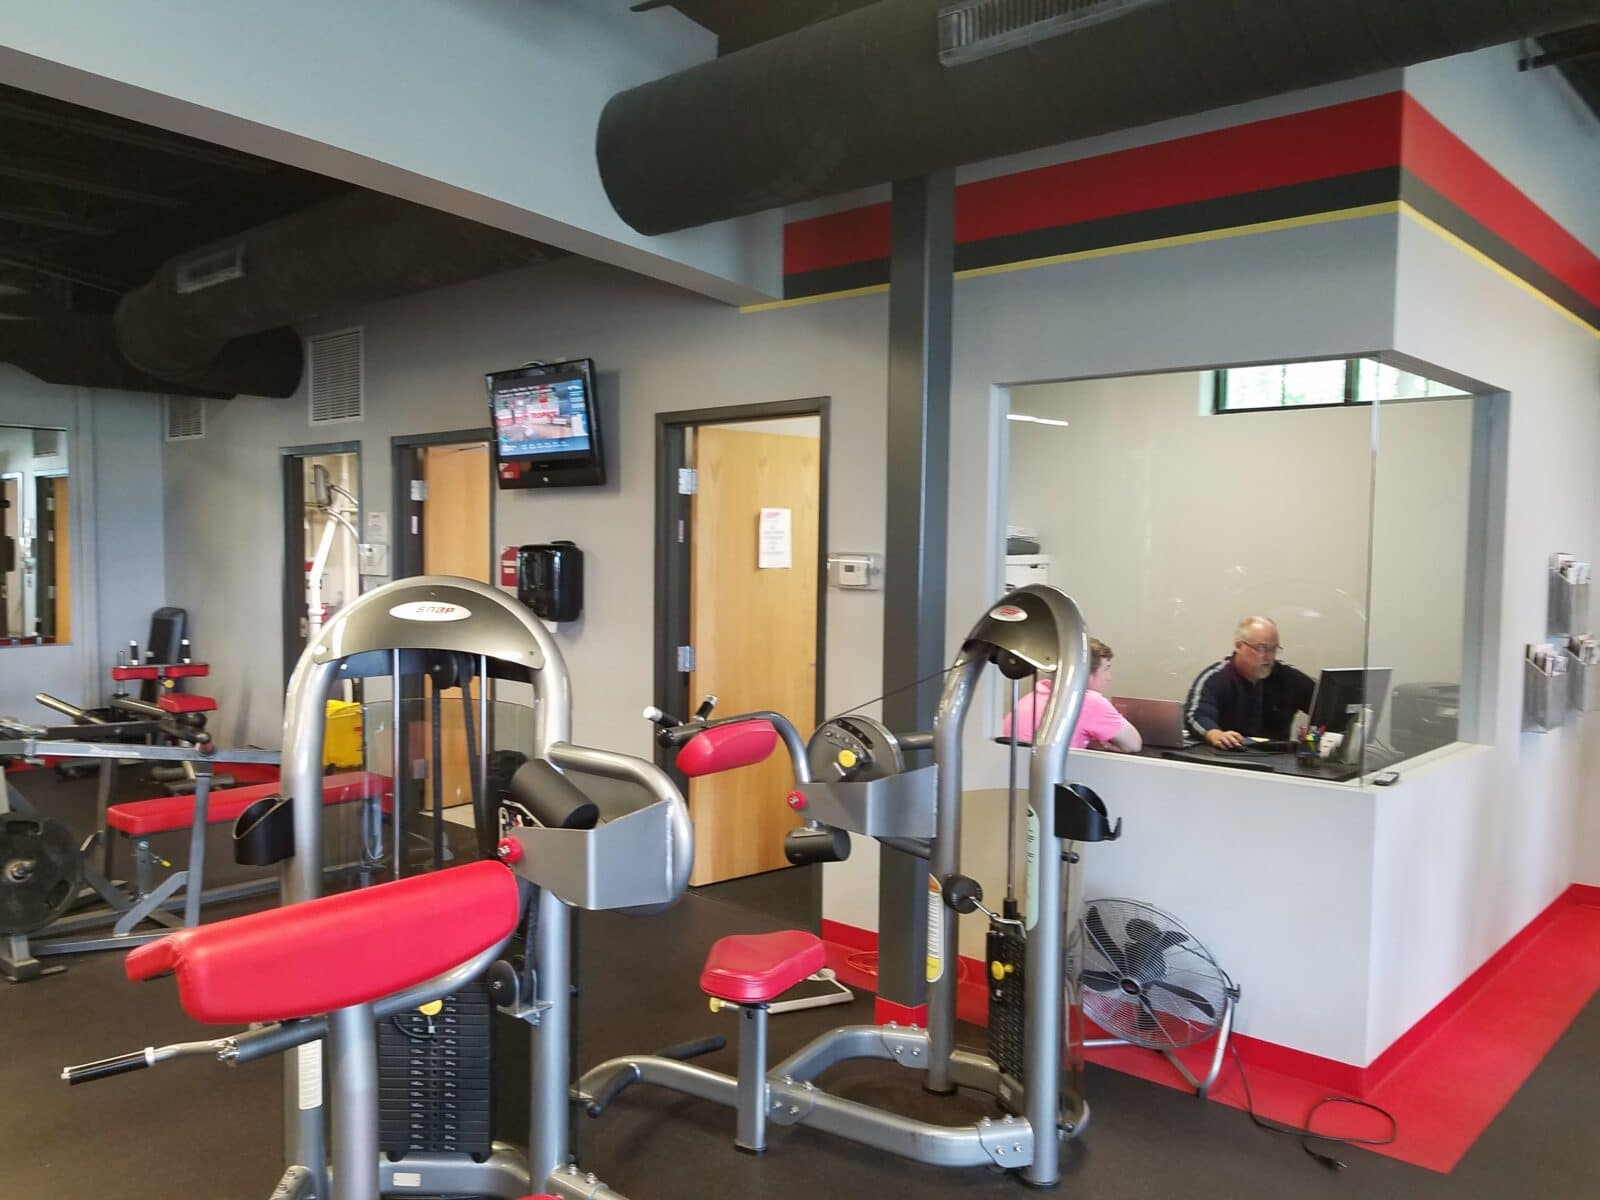 snap fitness, construction management associates, general contractors